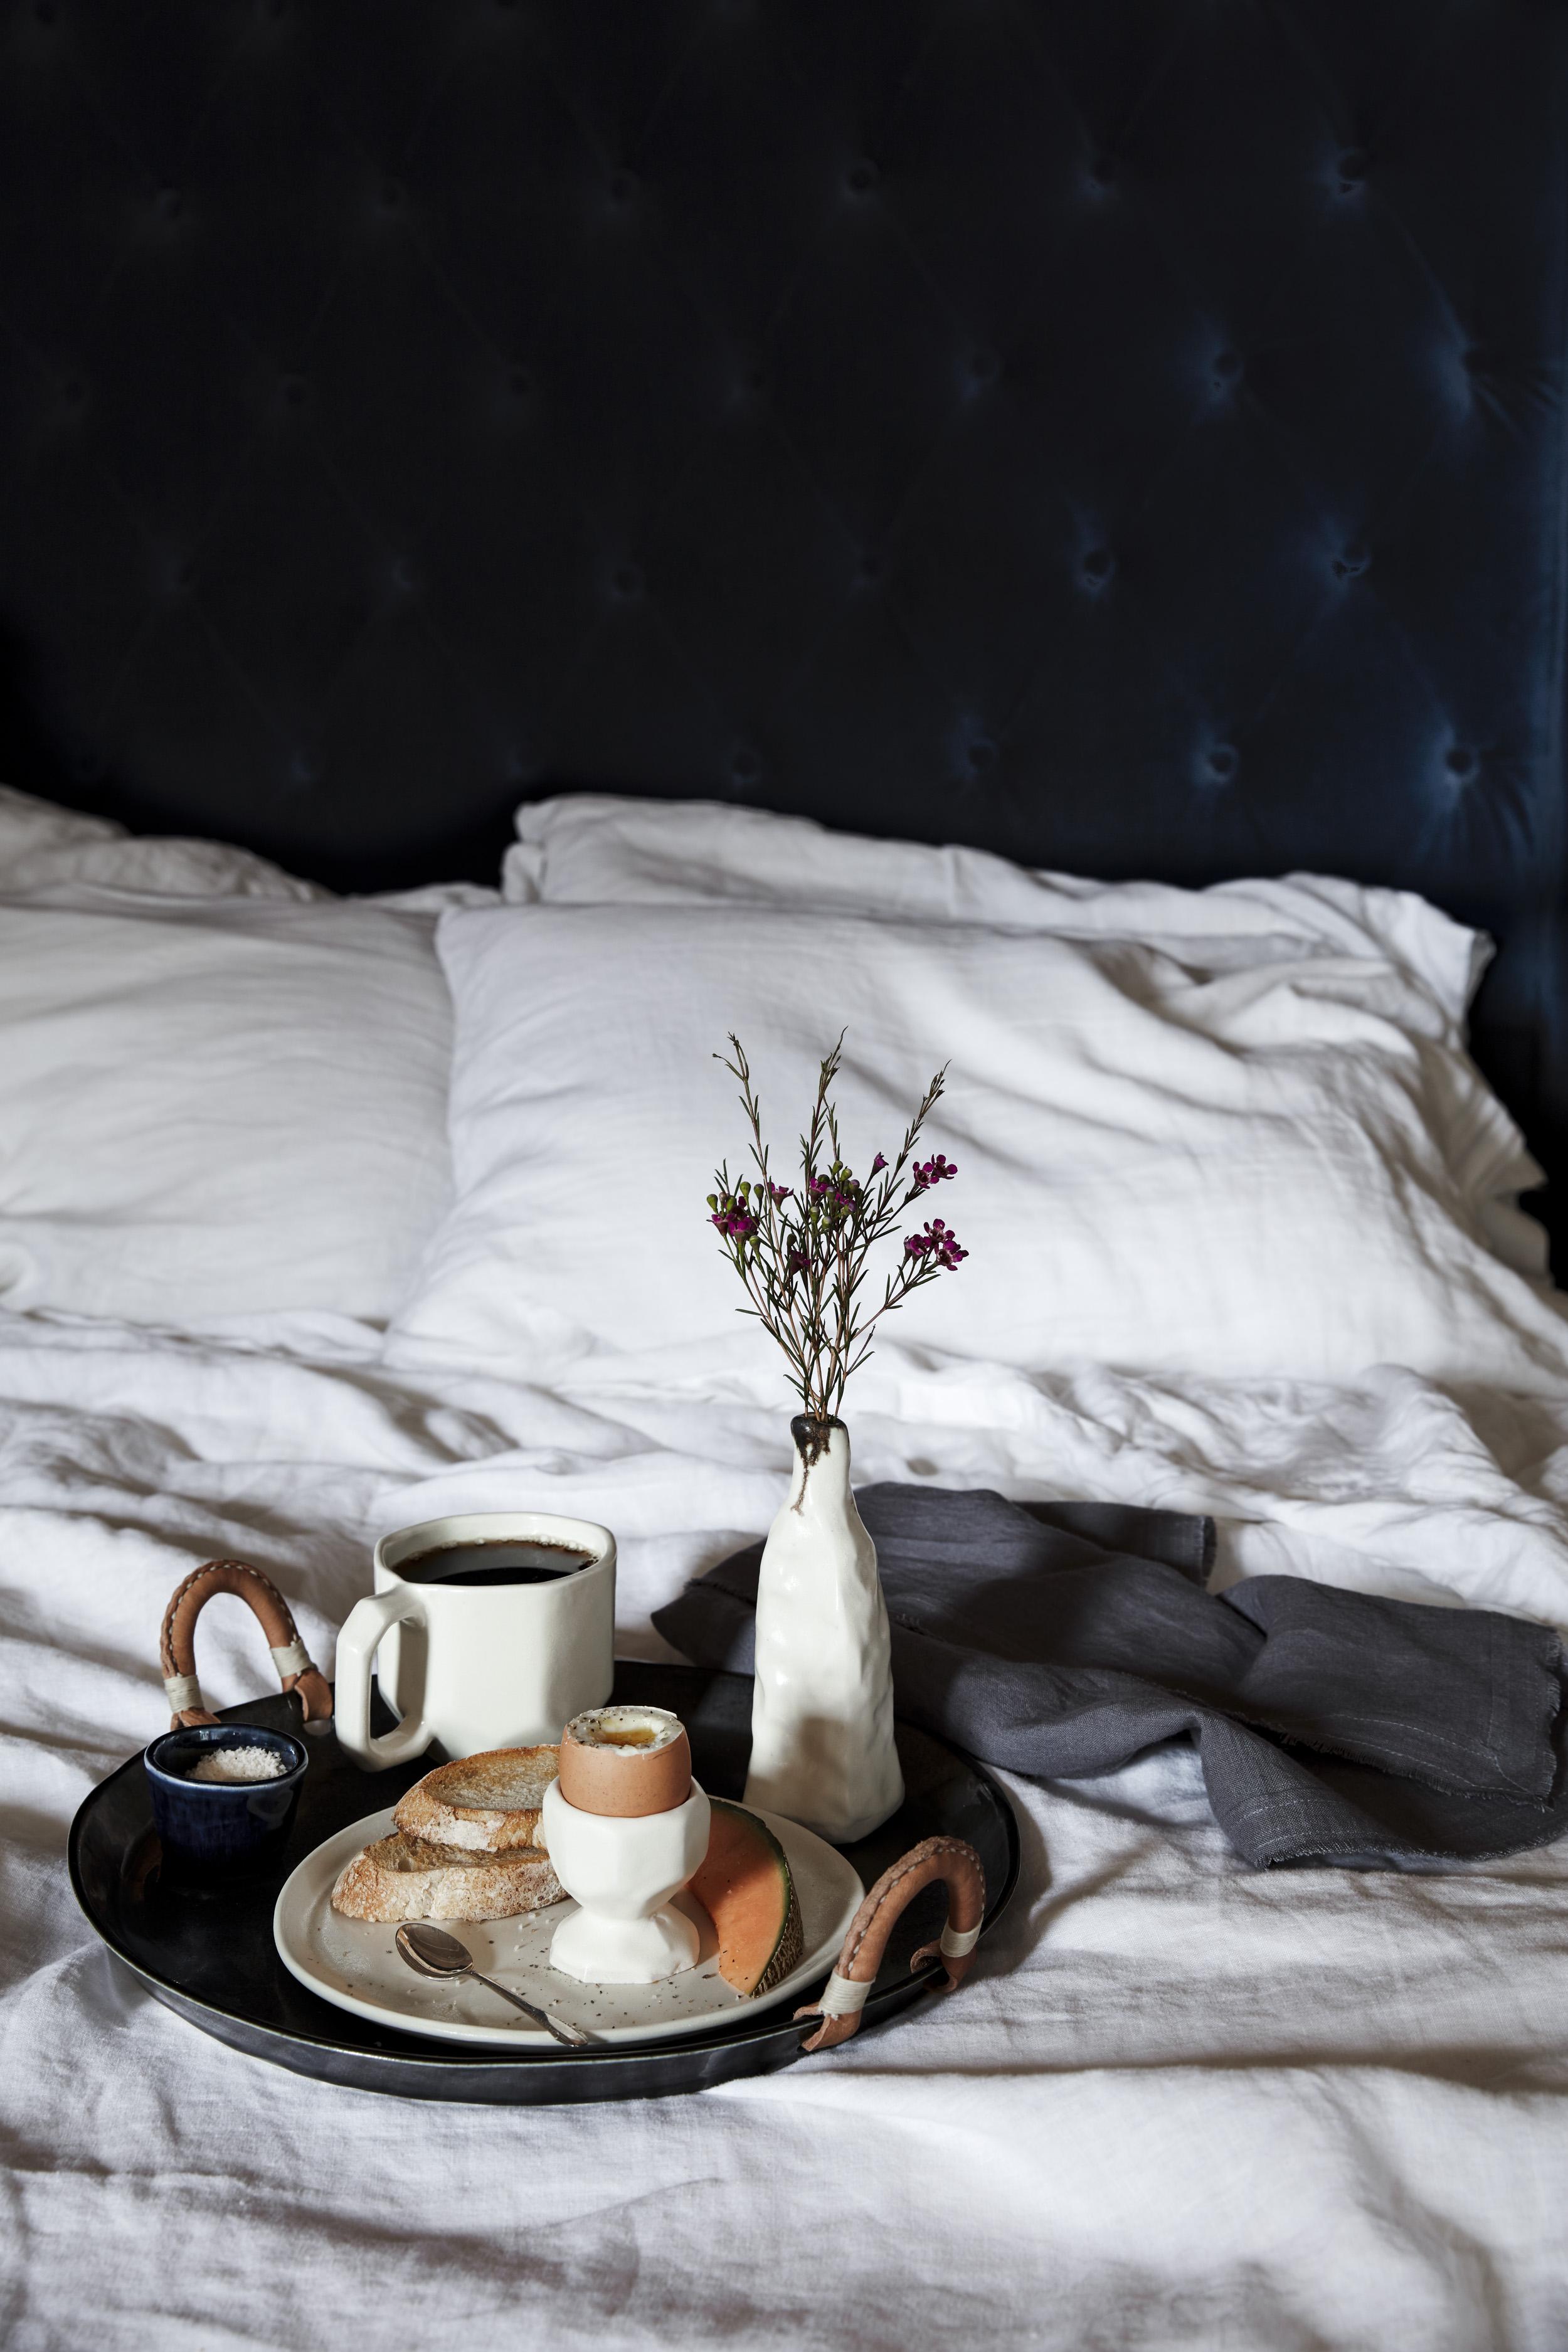 28_Spring_Breakfast_in_bed_1.jpg